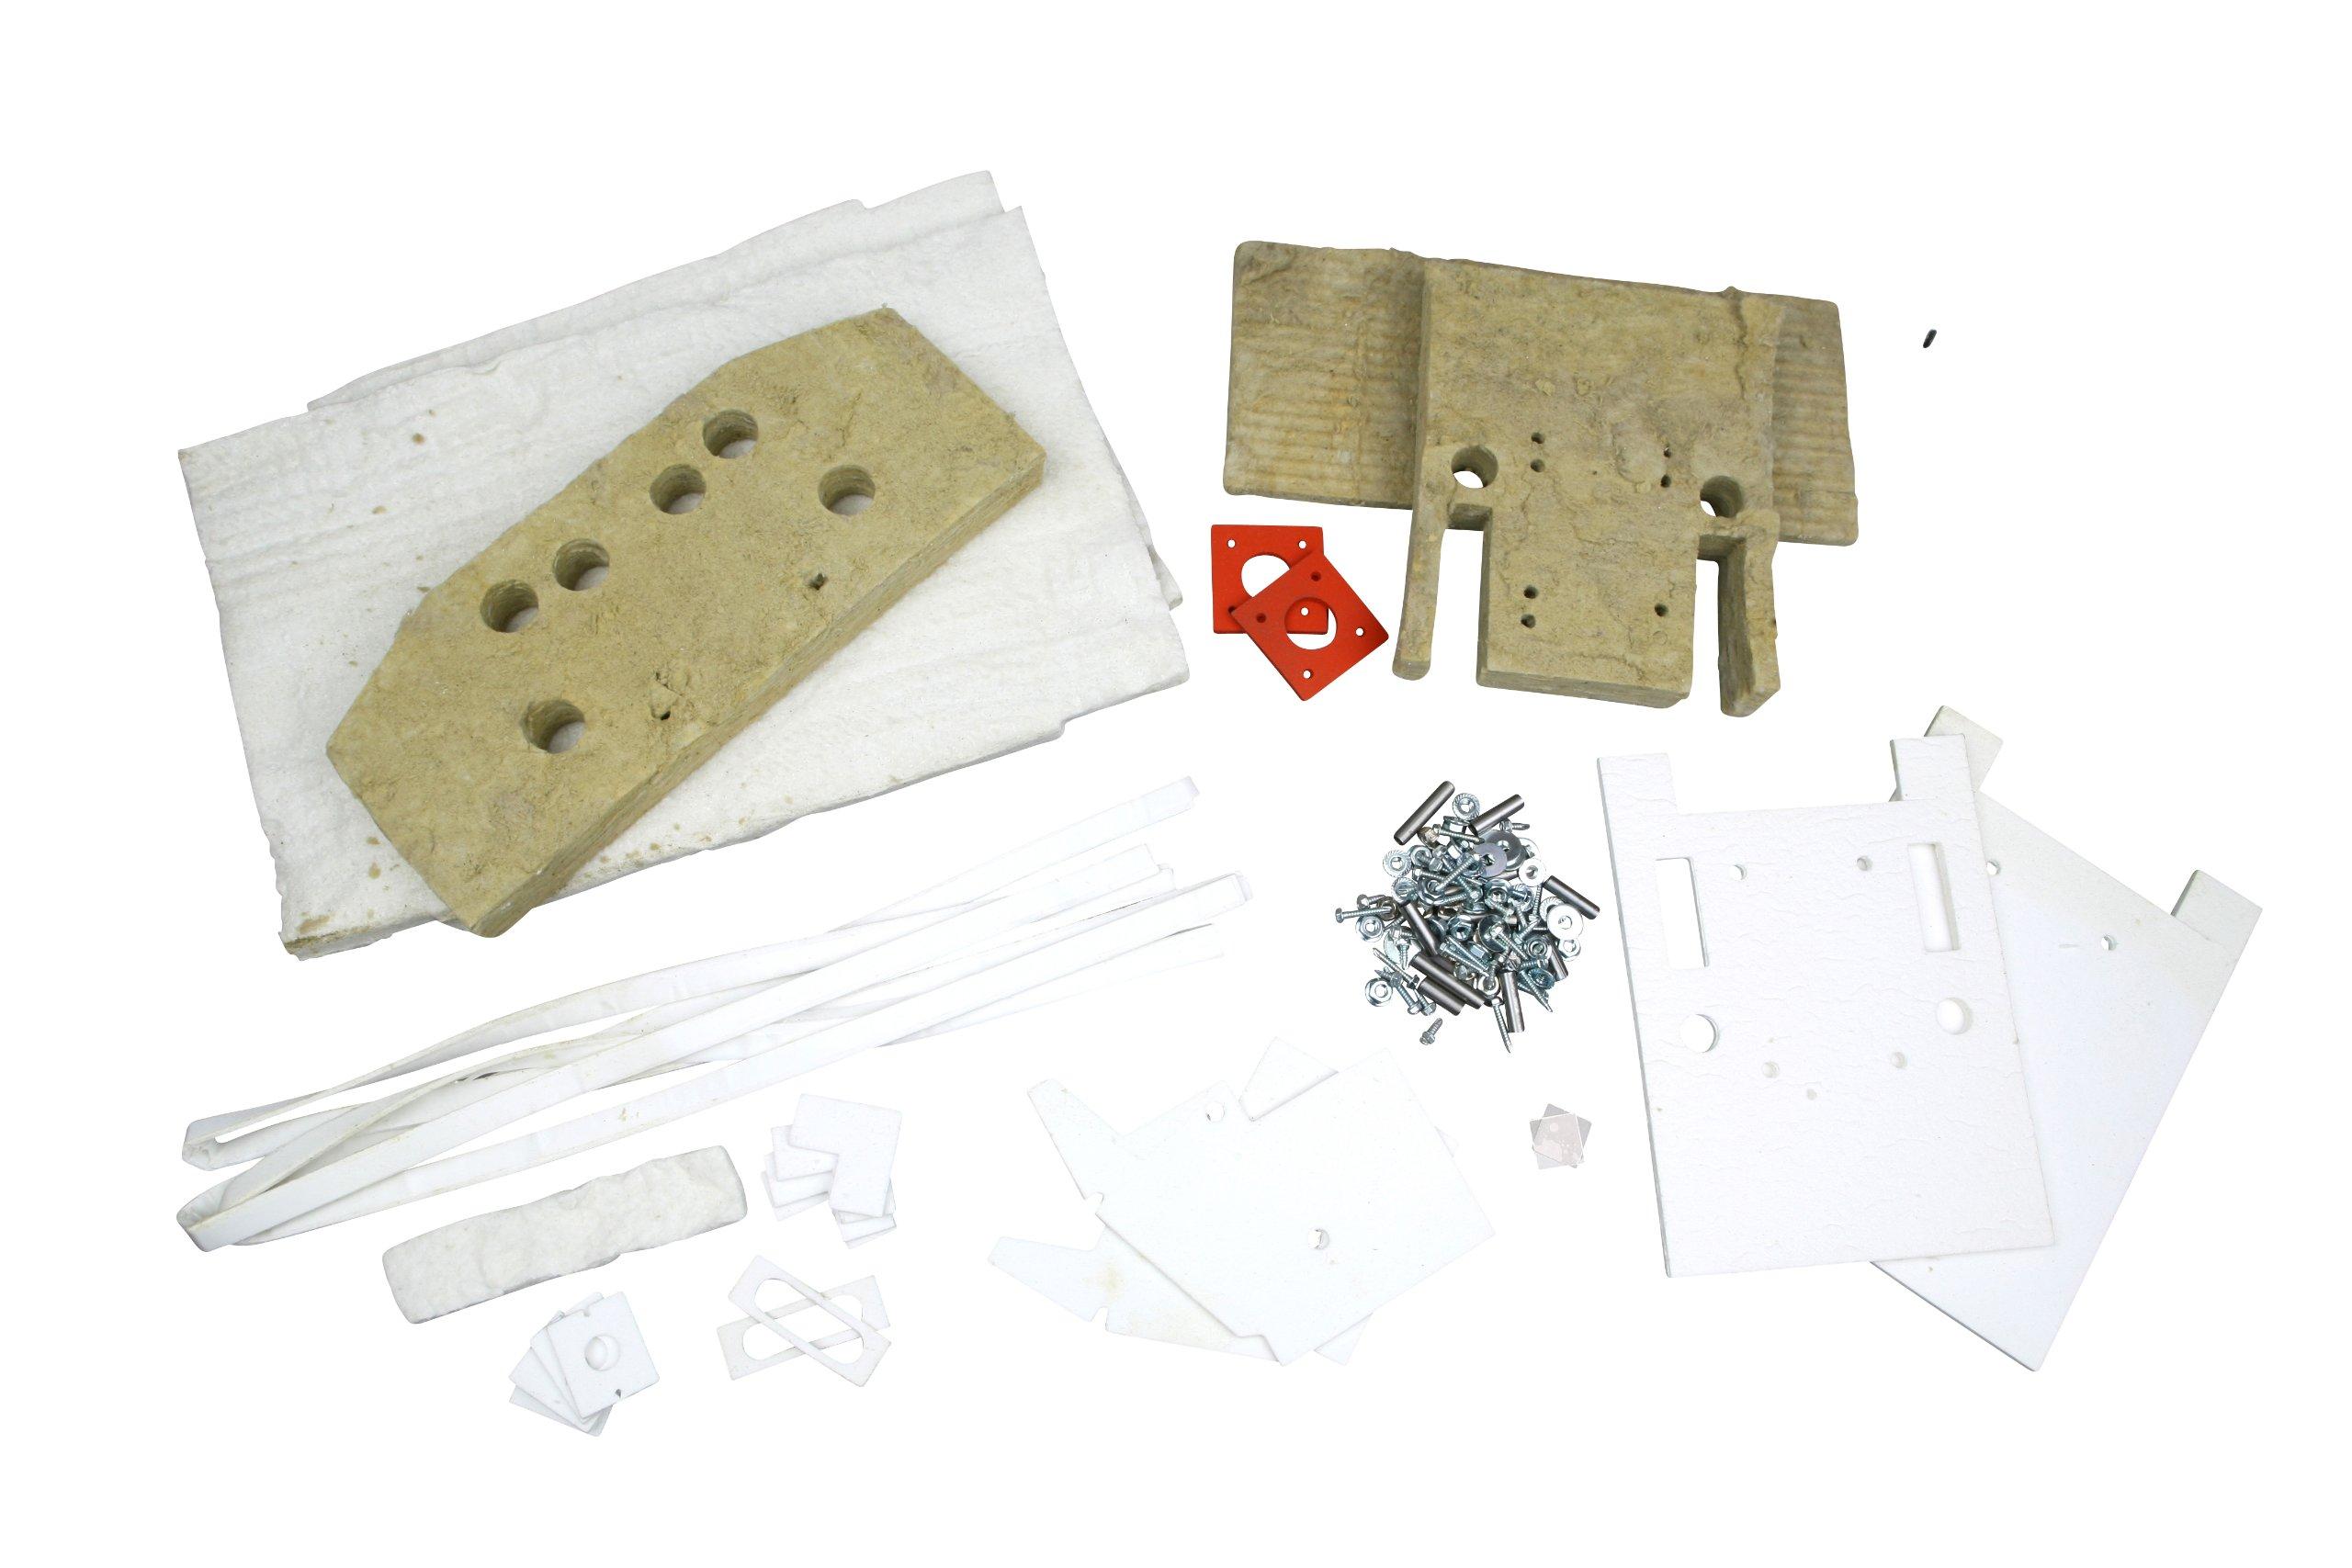 Frymaster 826-0930 Pot Insulation Kit